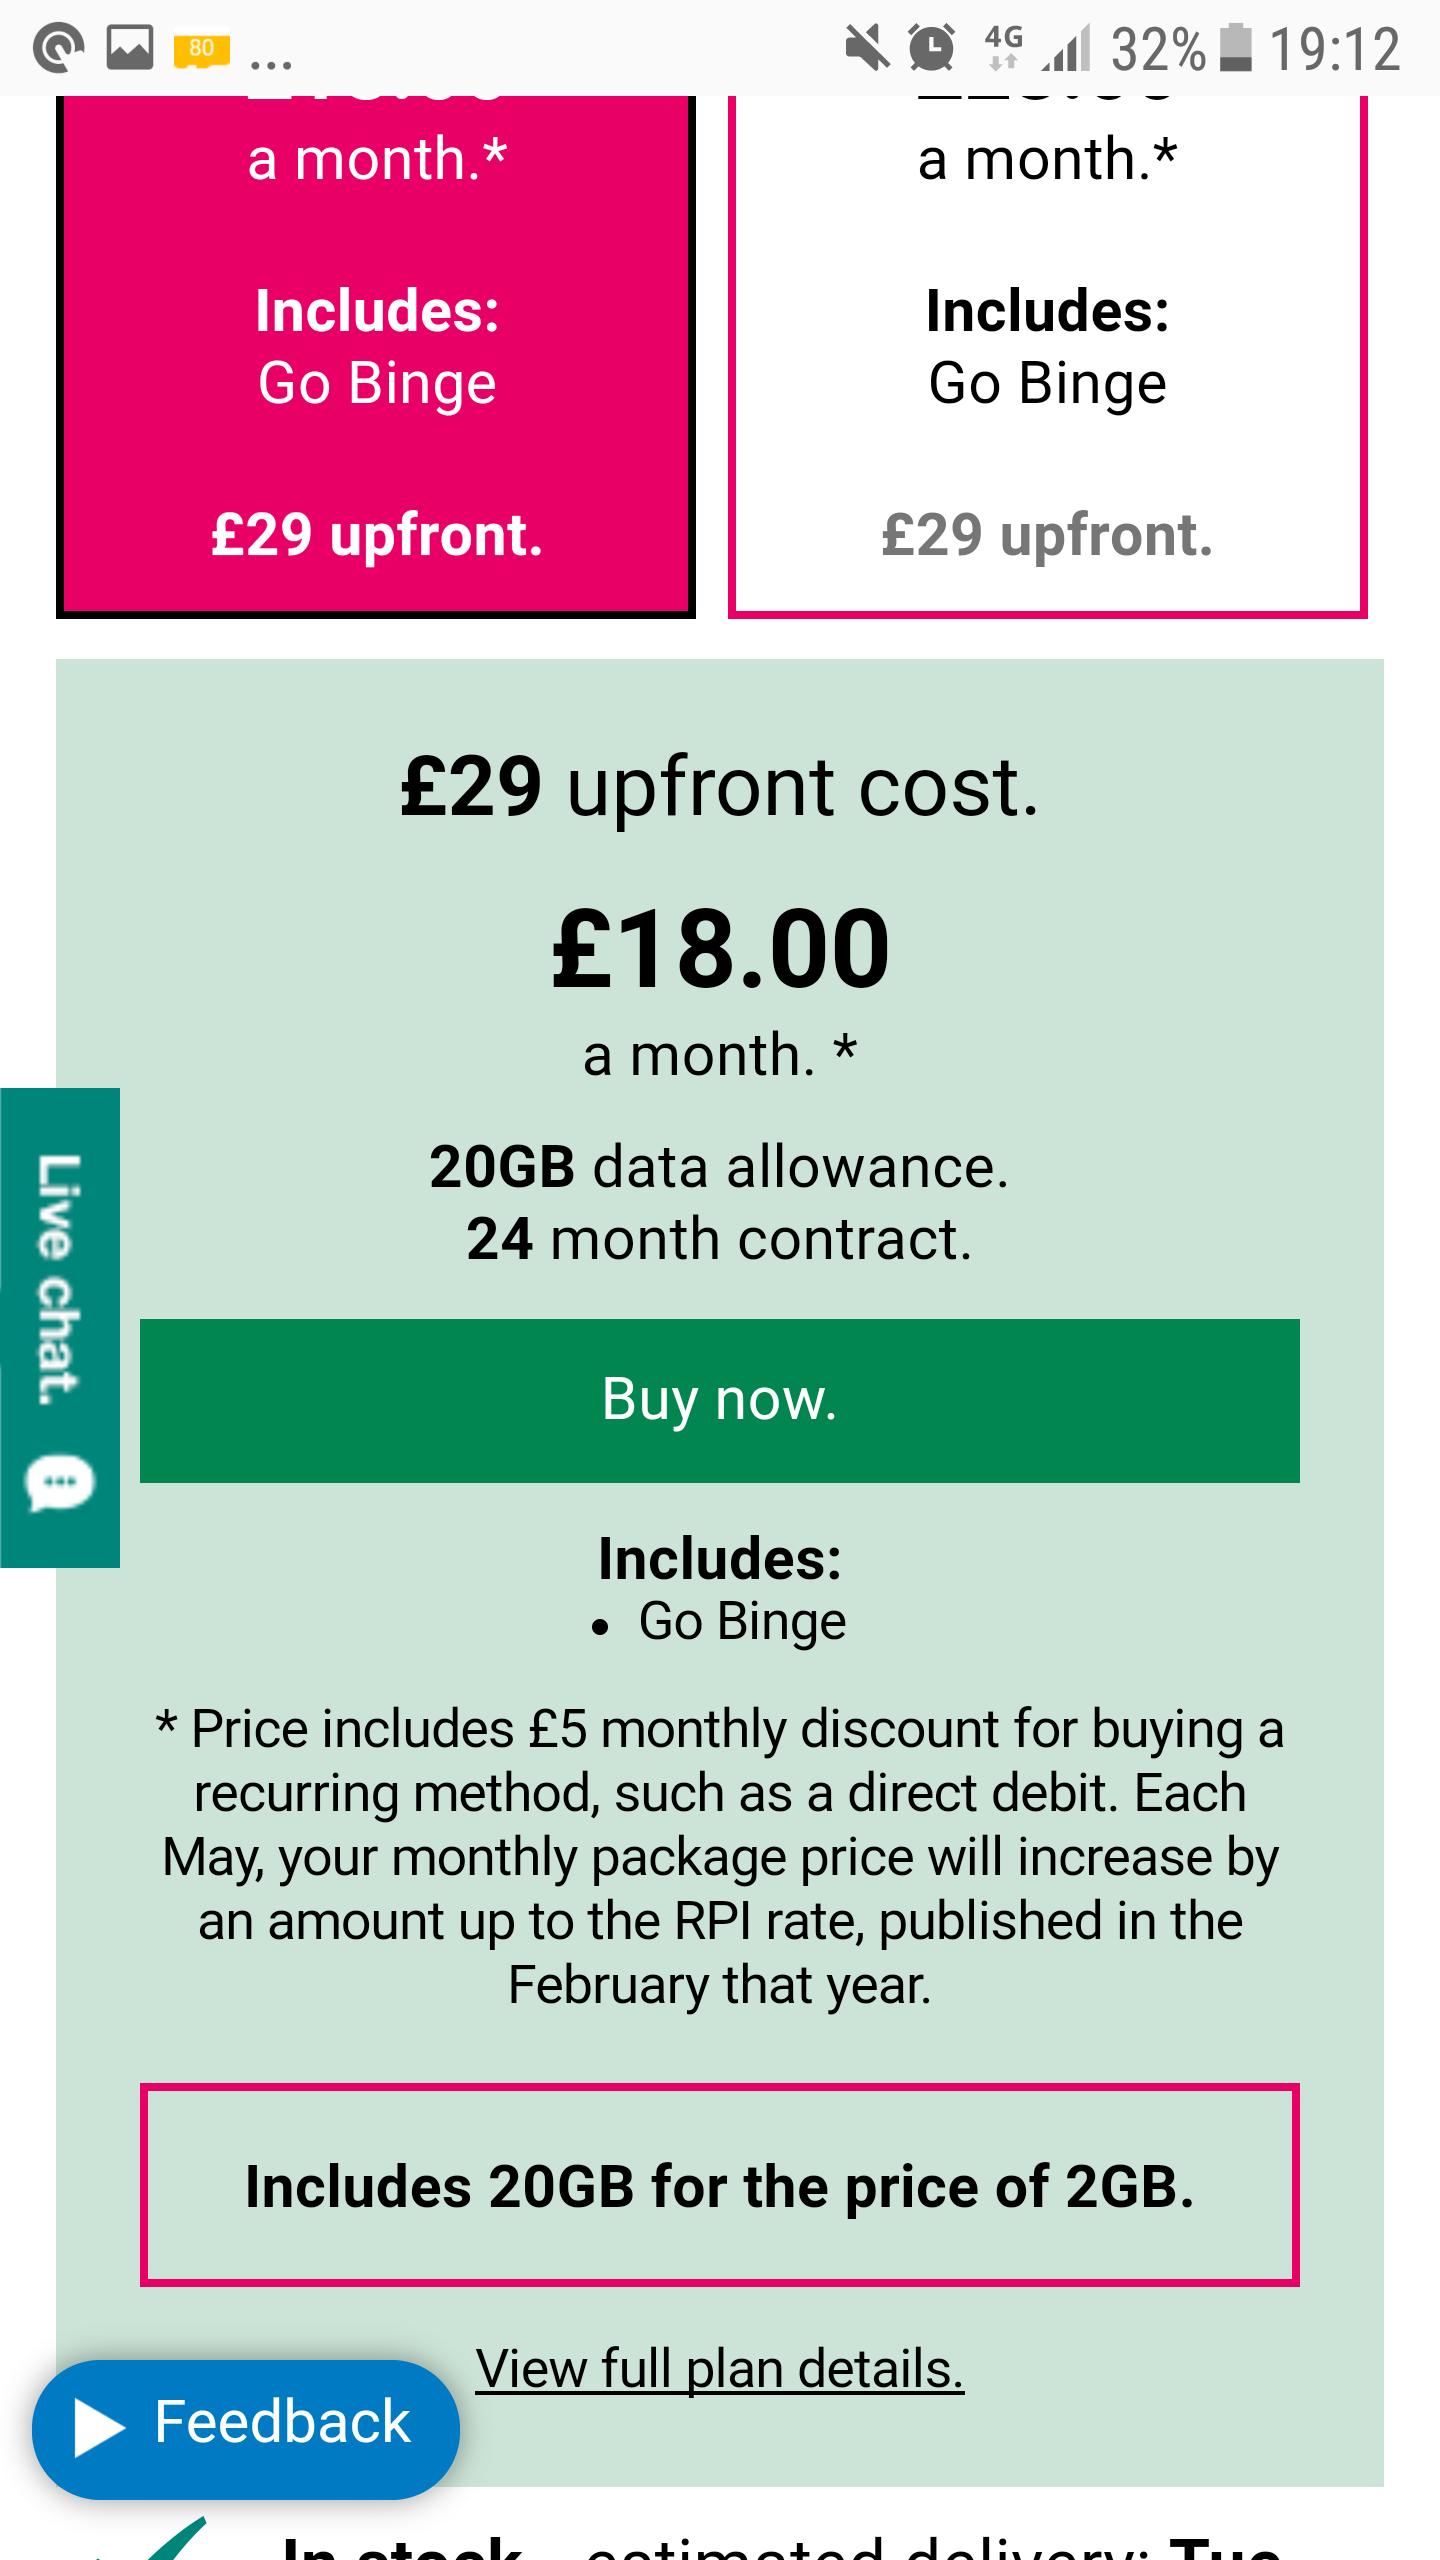 Samsung Galaxy Tab A 10.1 4g on Three 20Gb for the price of 2Gb £461 @ Three